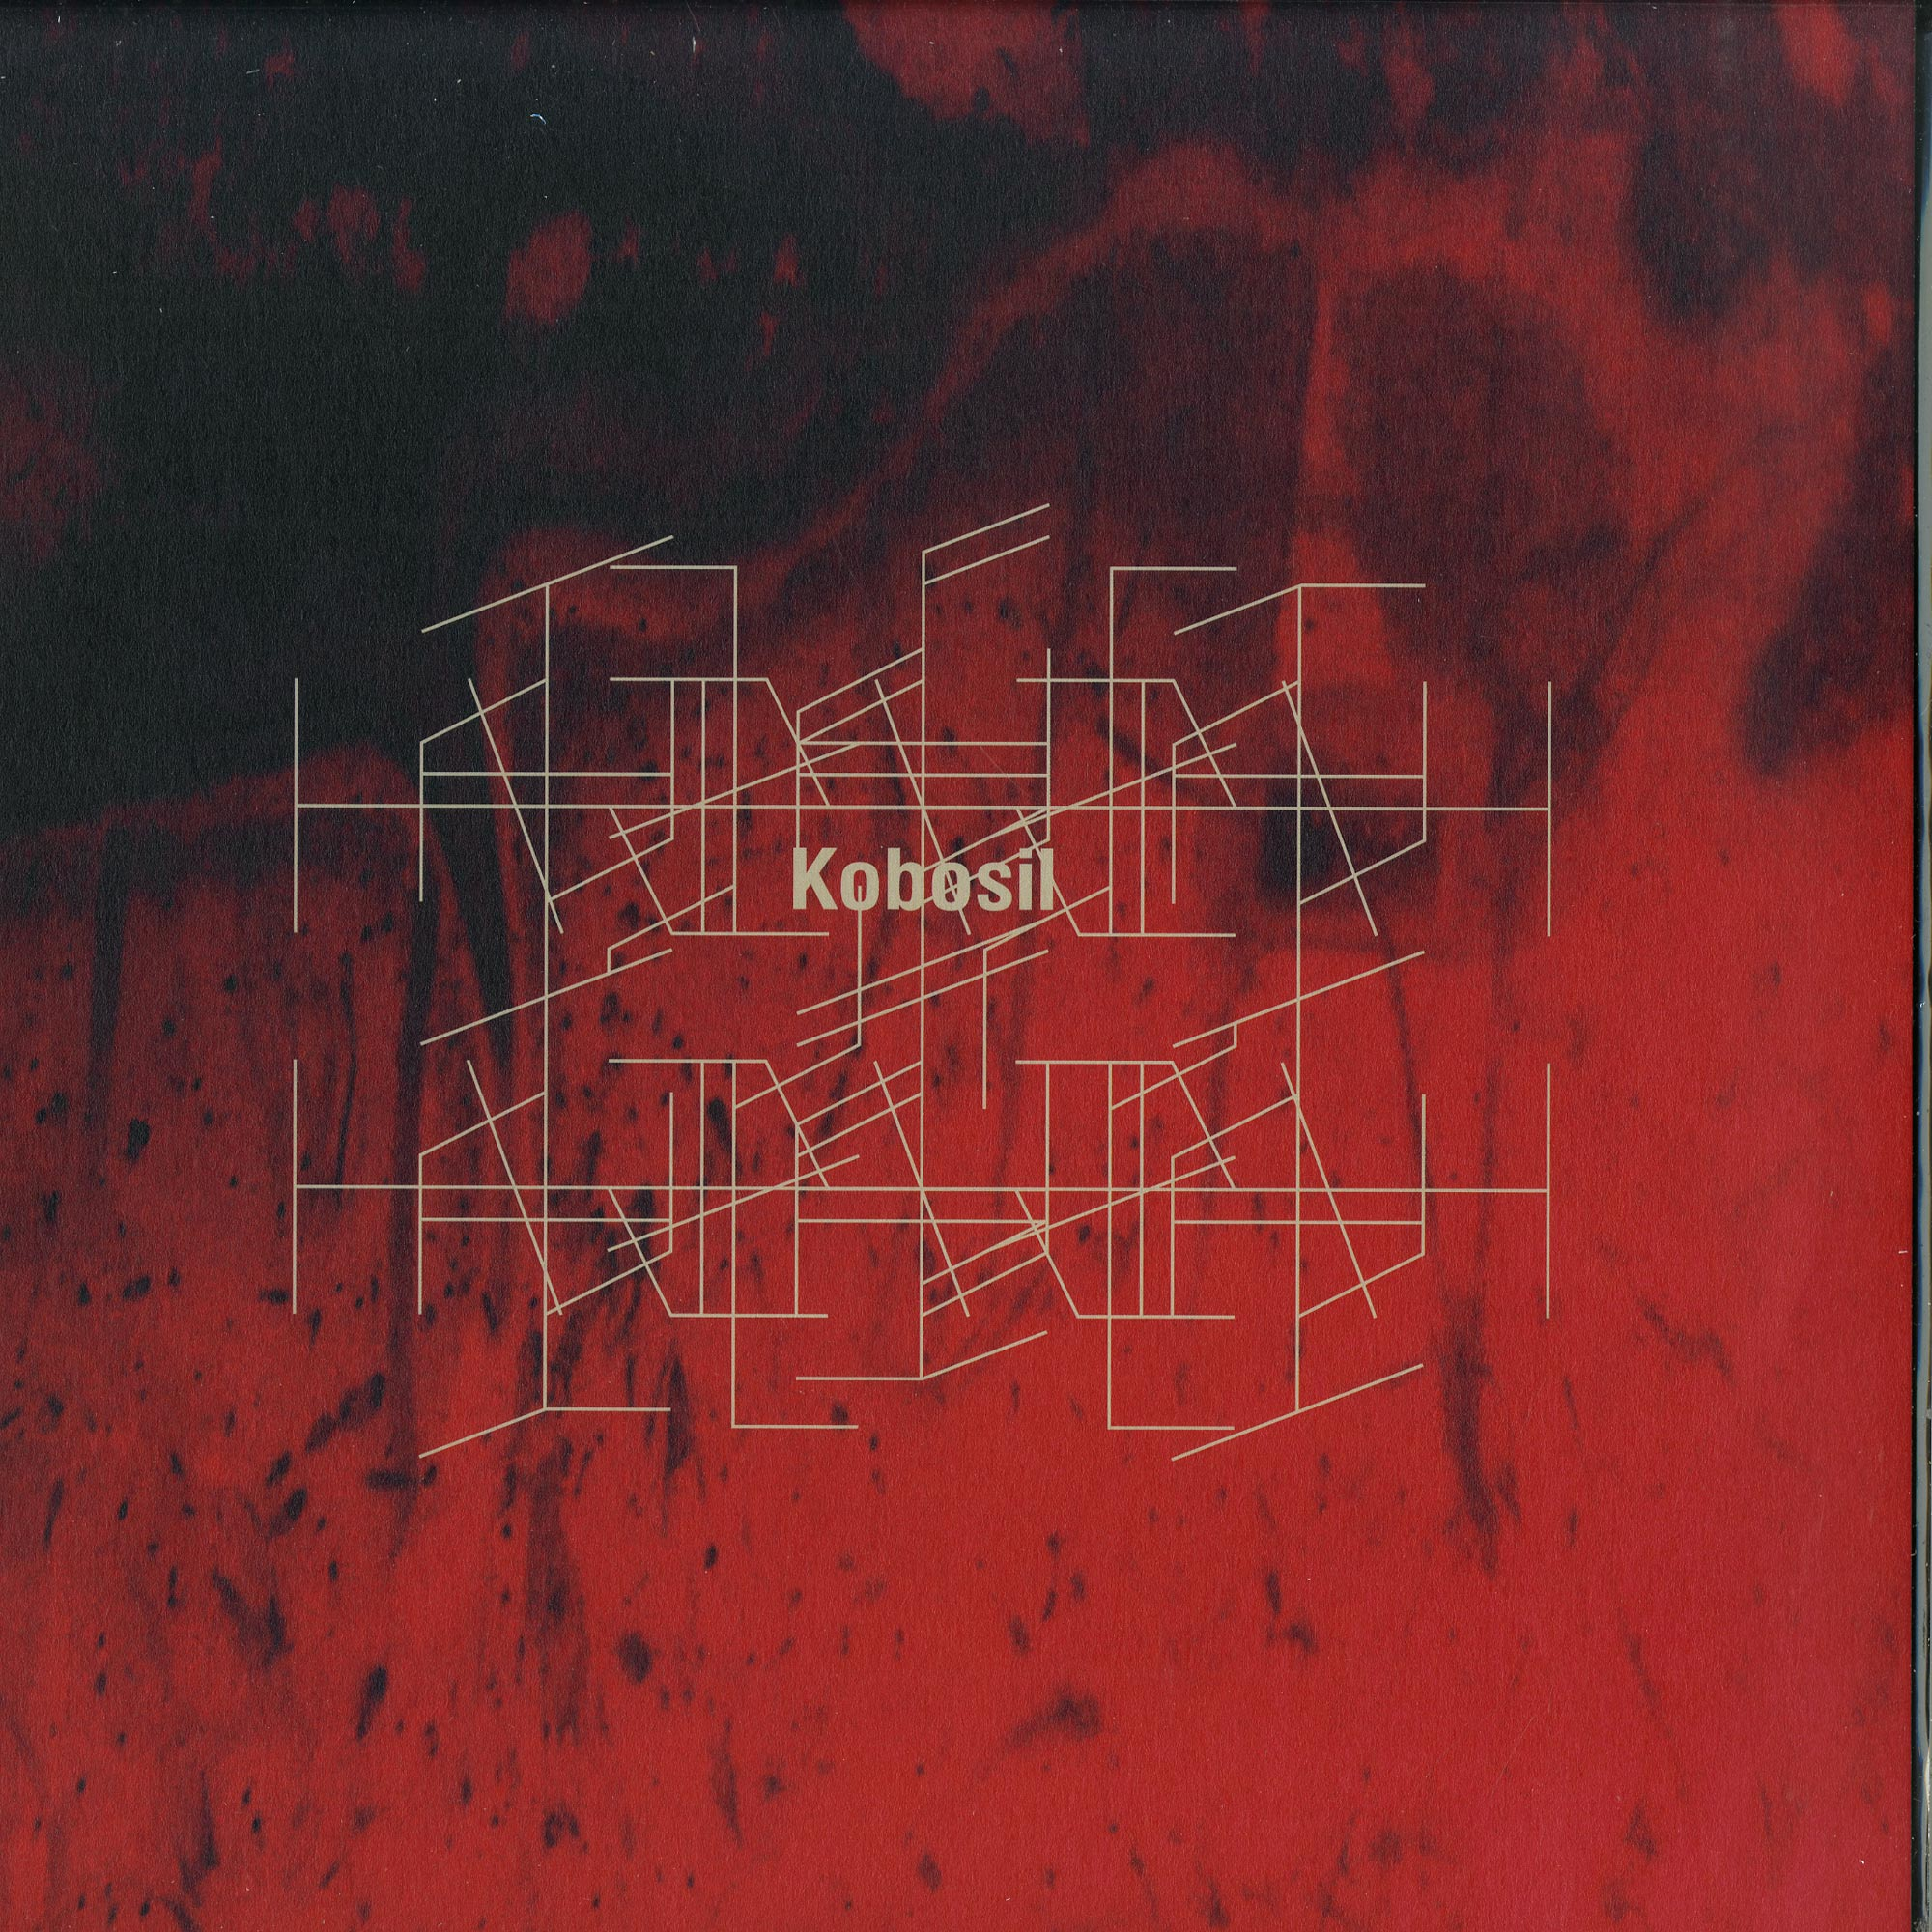 Kobosil - 105